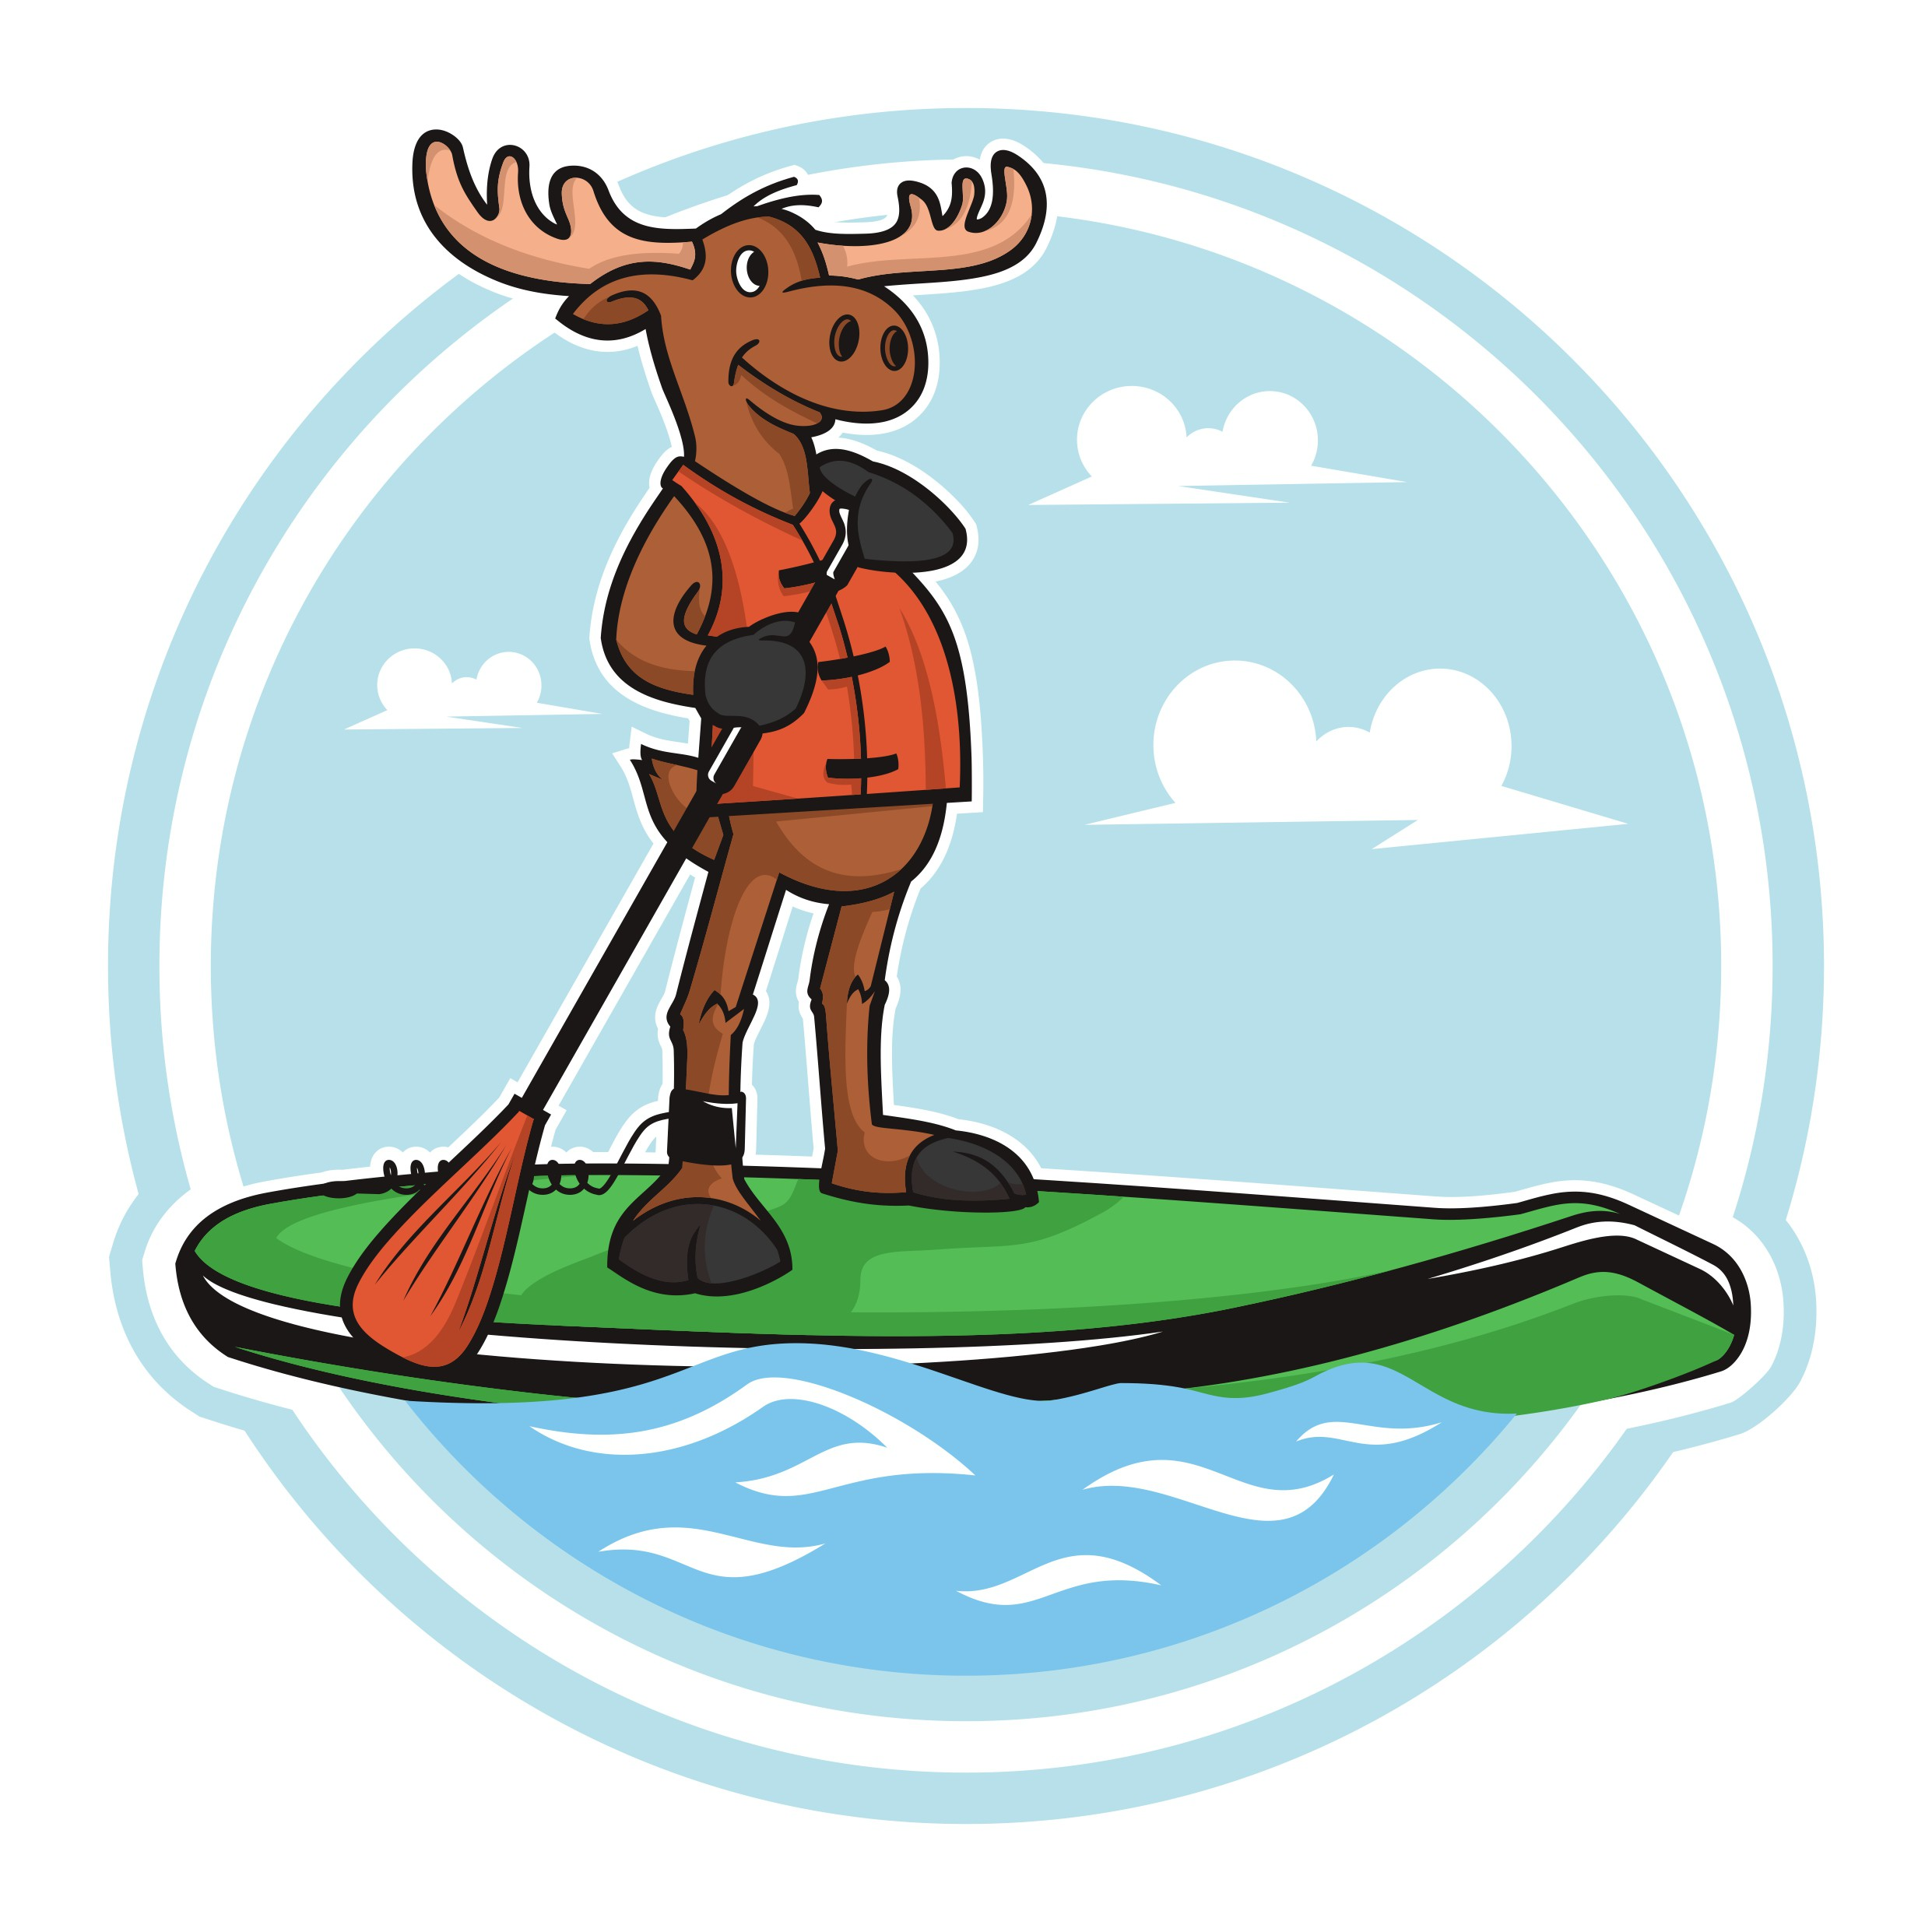 Further development of Moose Canoe Hire Logo